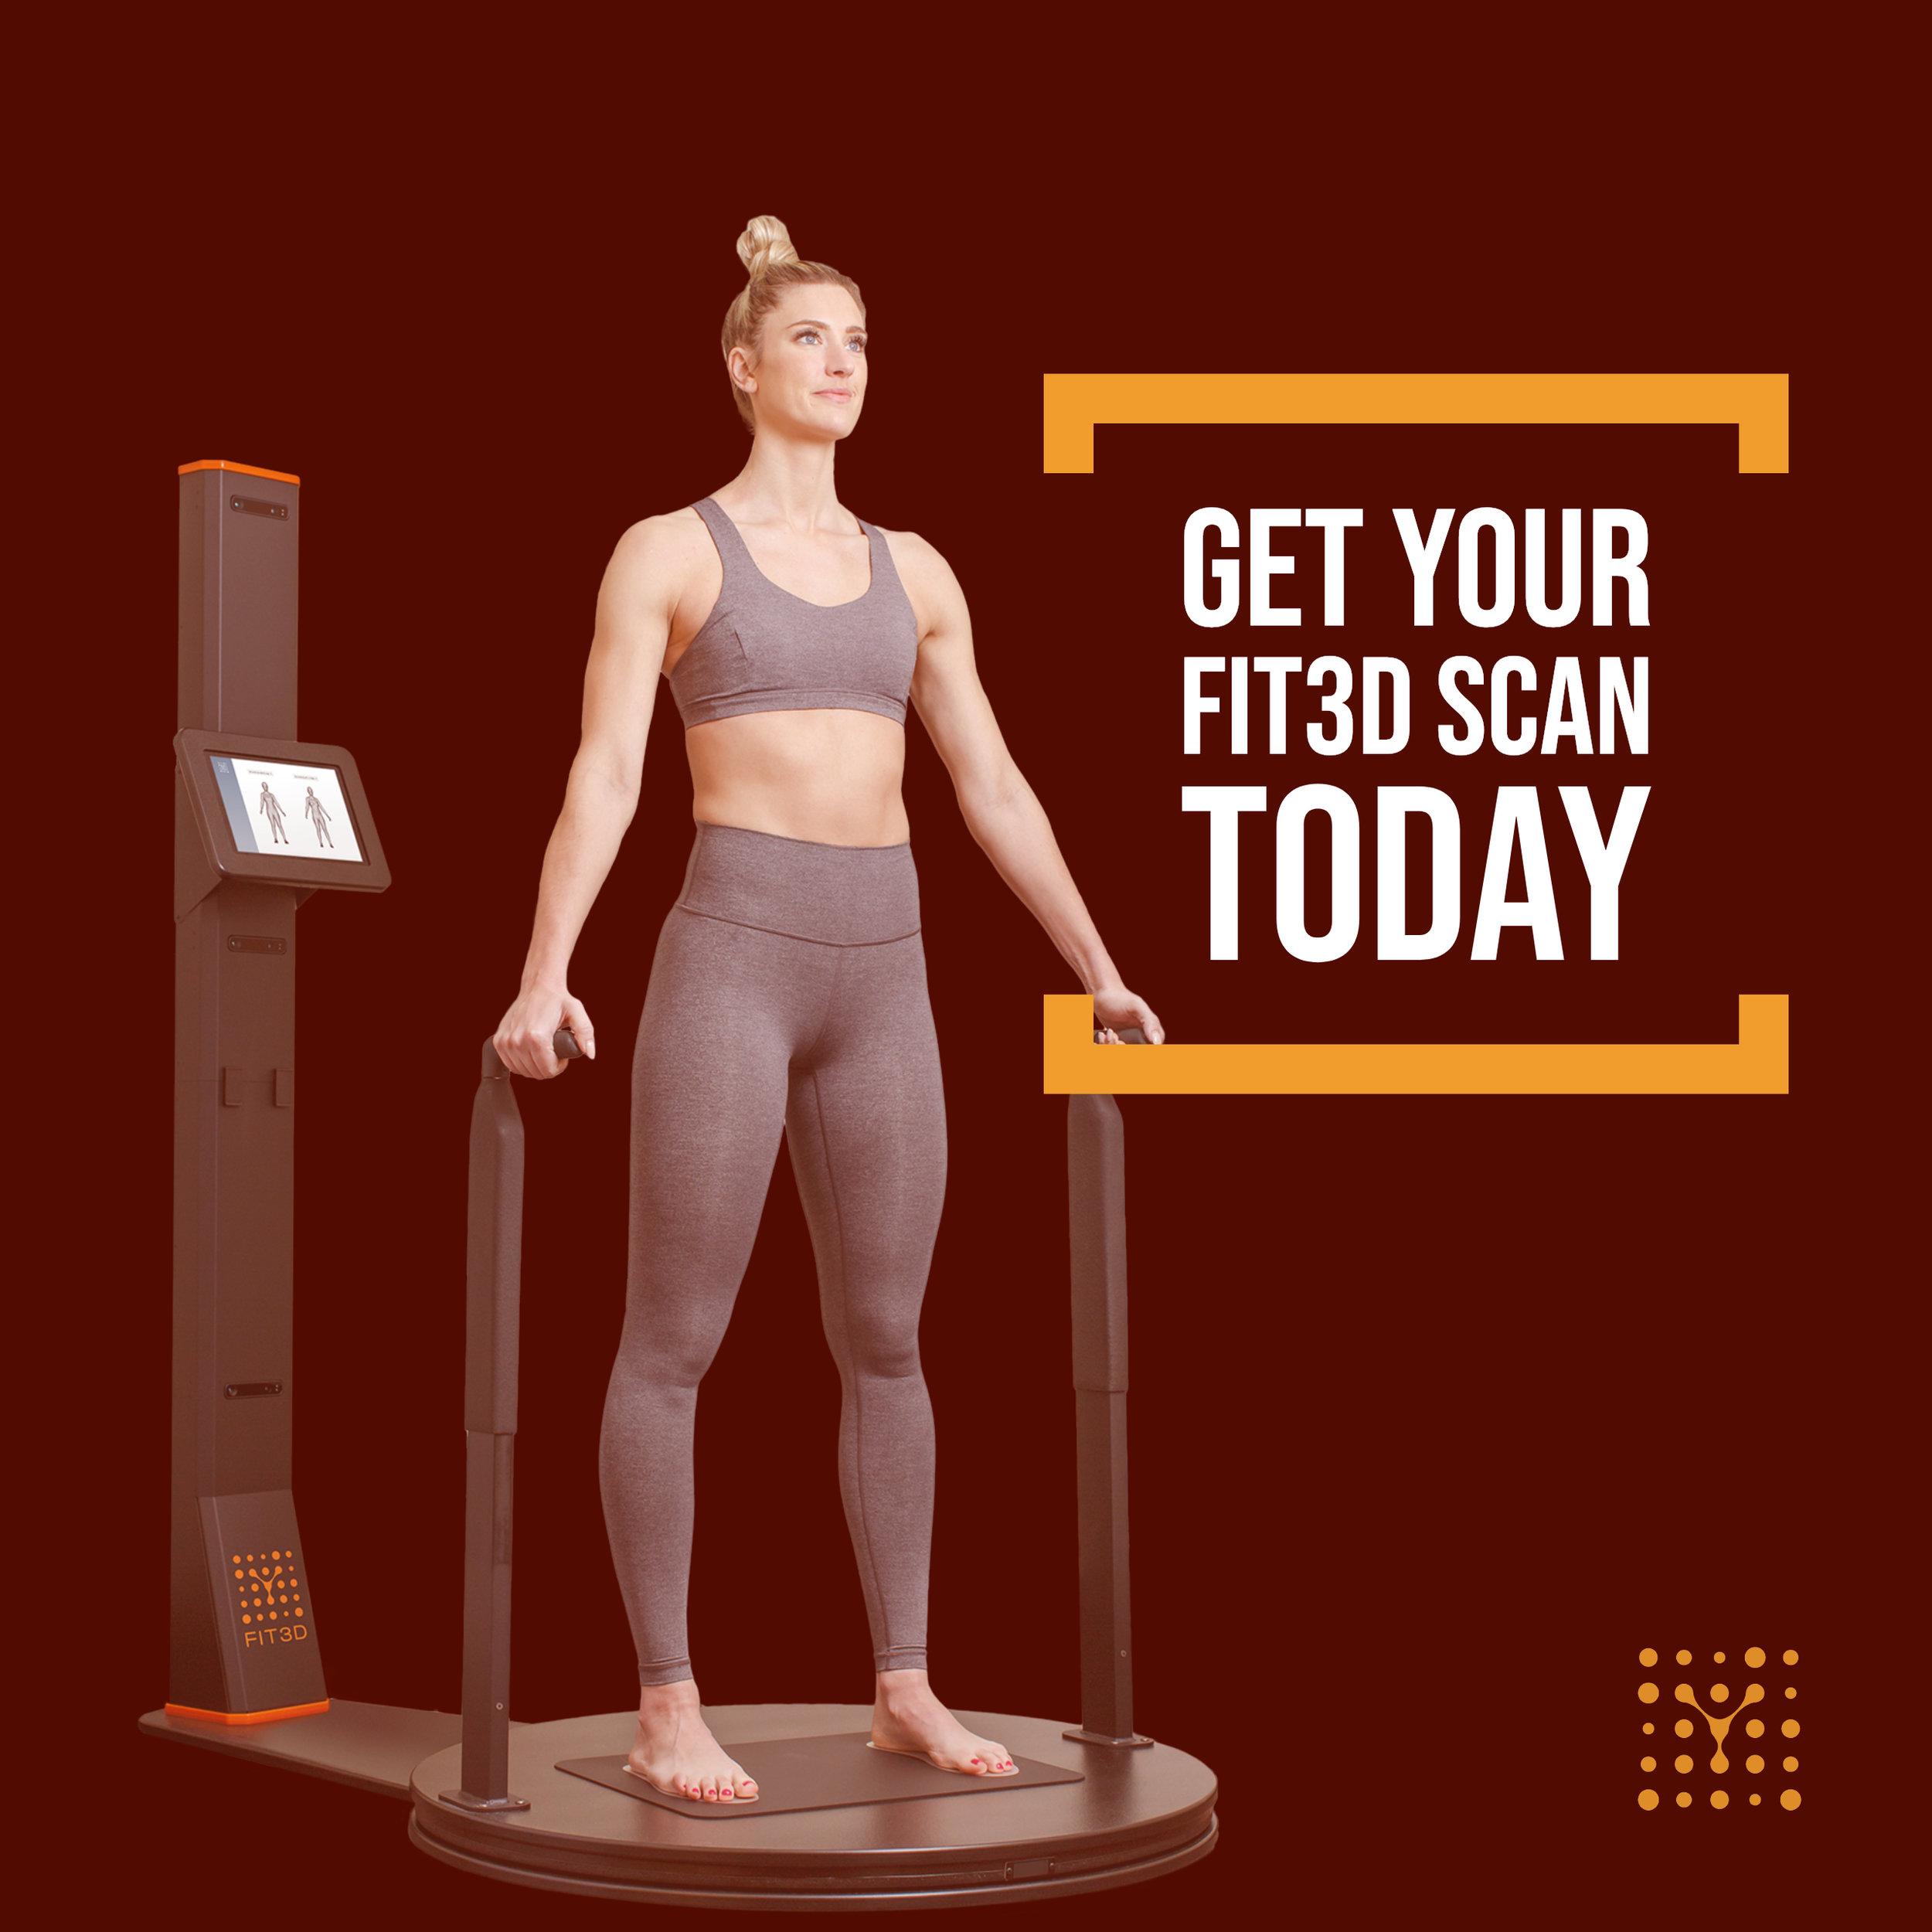 Fit3d-GetAScan-1.jpg